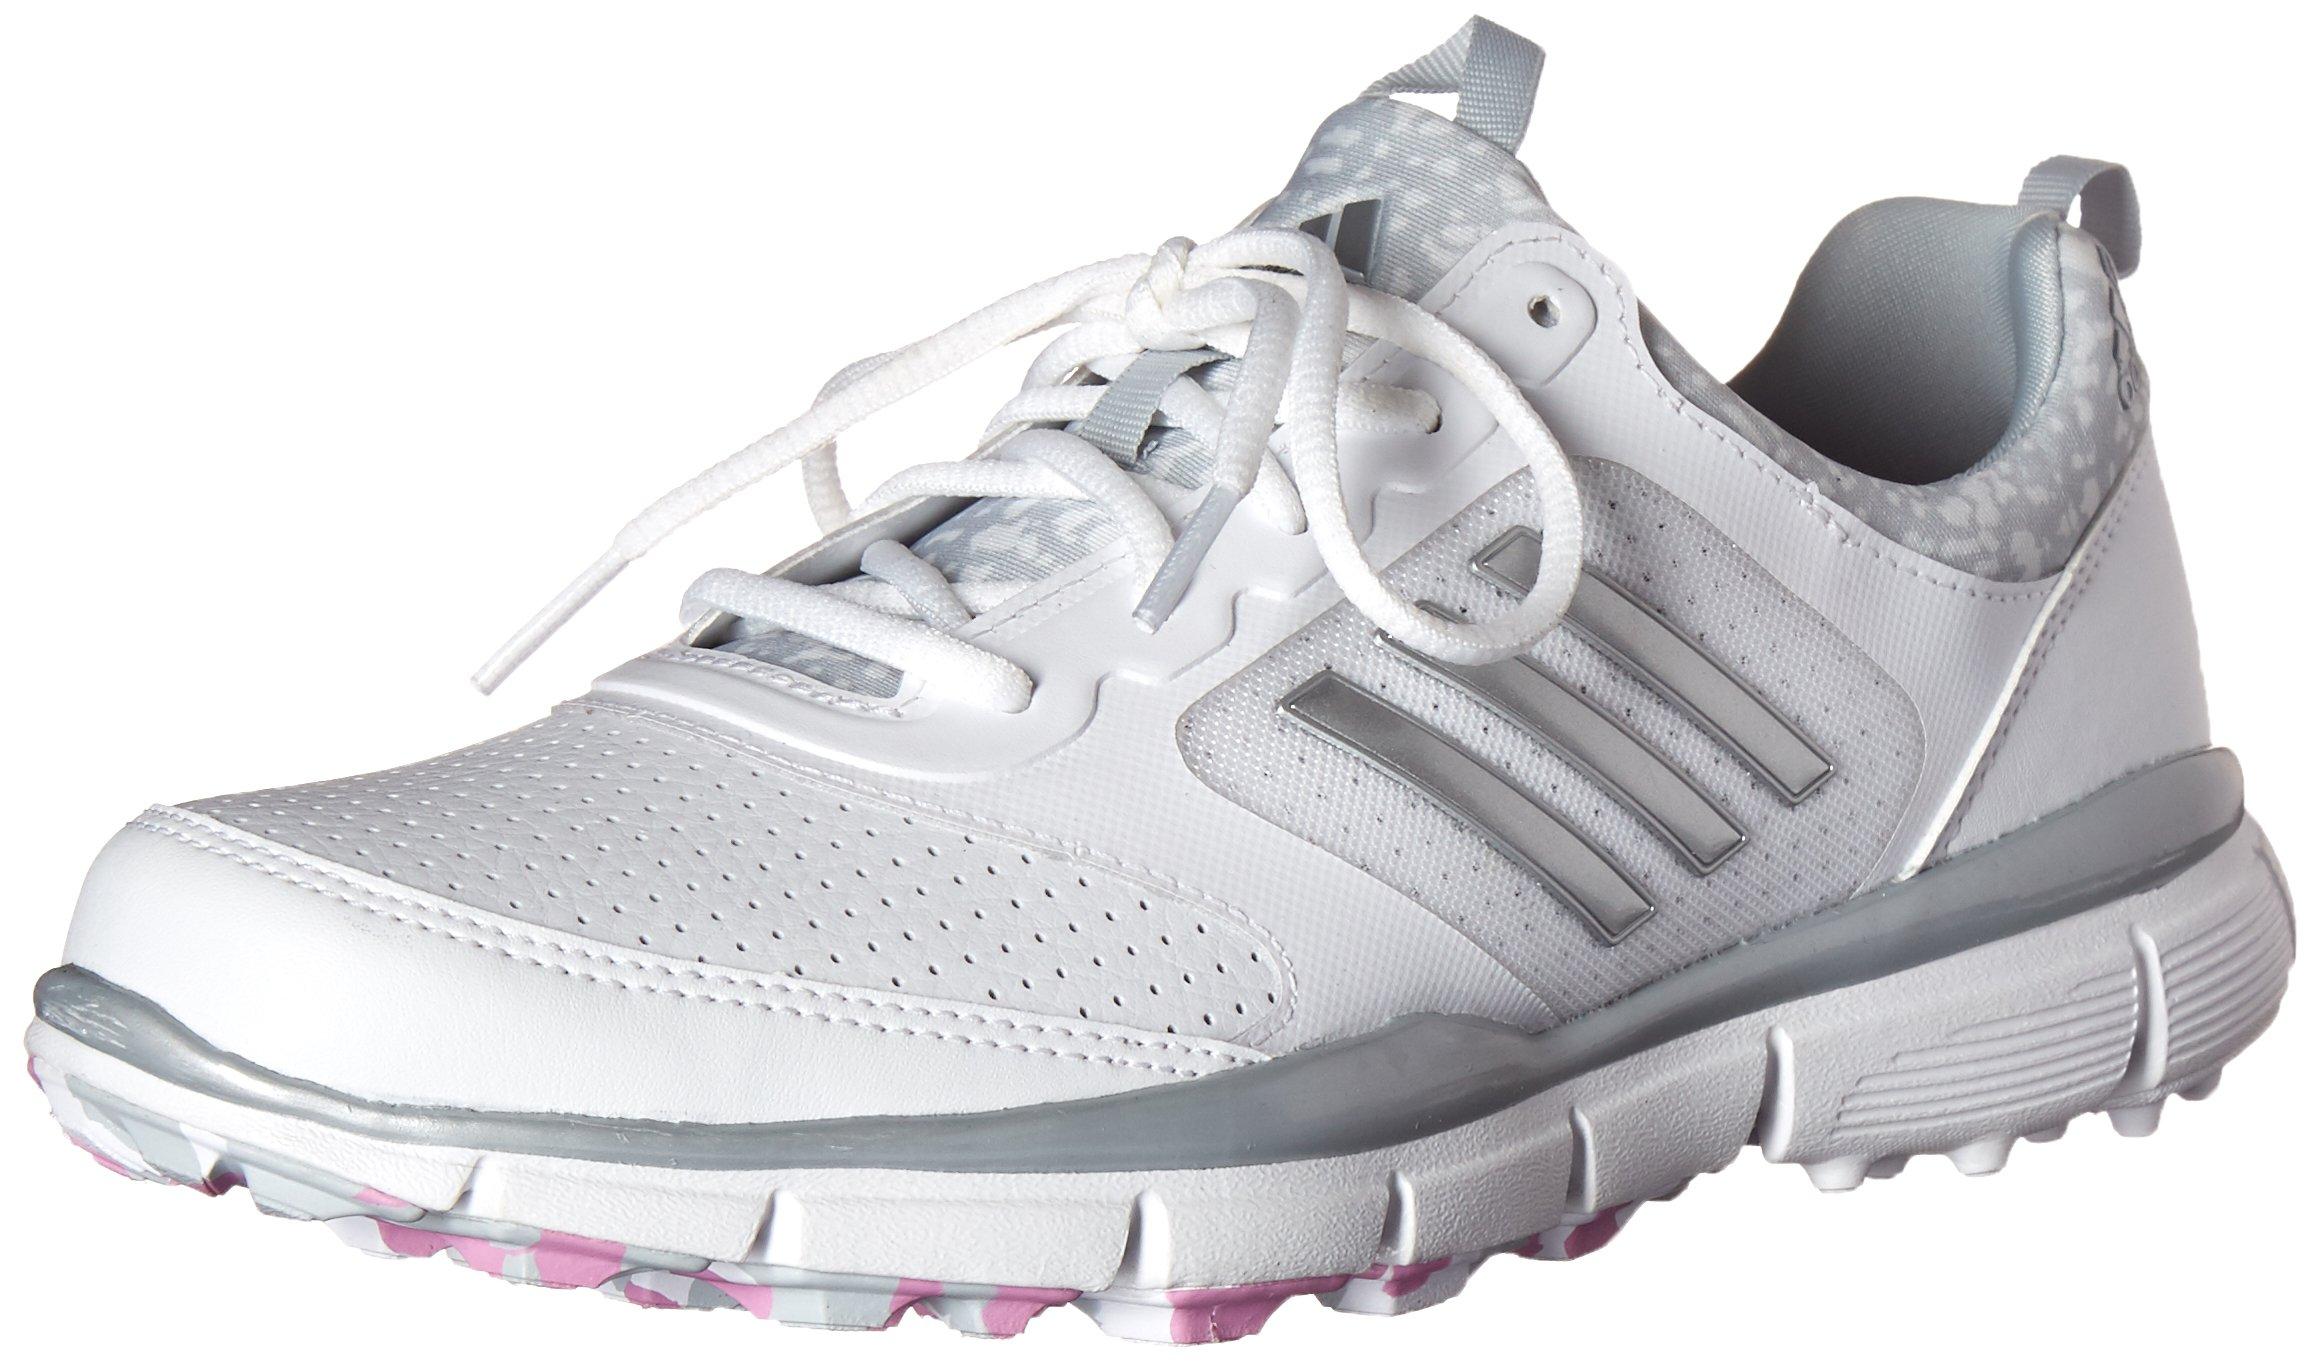 adidas Women's W Adistar Sport Golf Spikeless, FTWR White/Matte Silver/Wild Orchid-TMAG, 7.5 M US